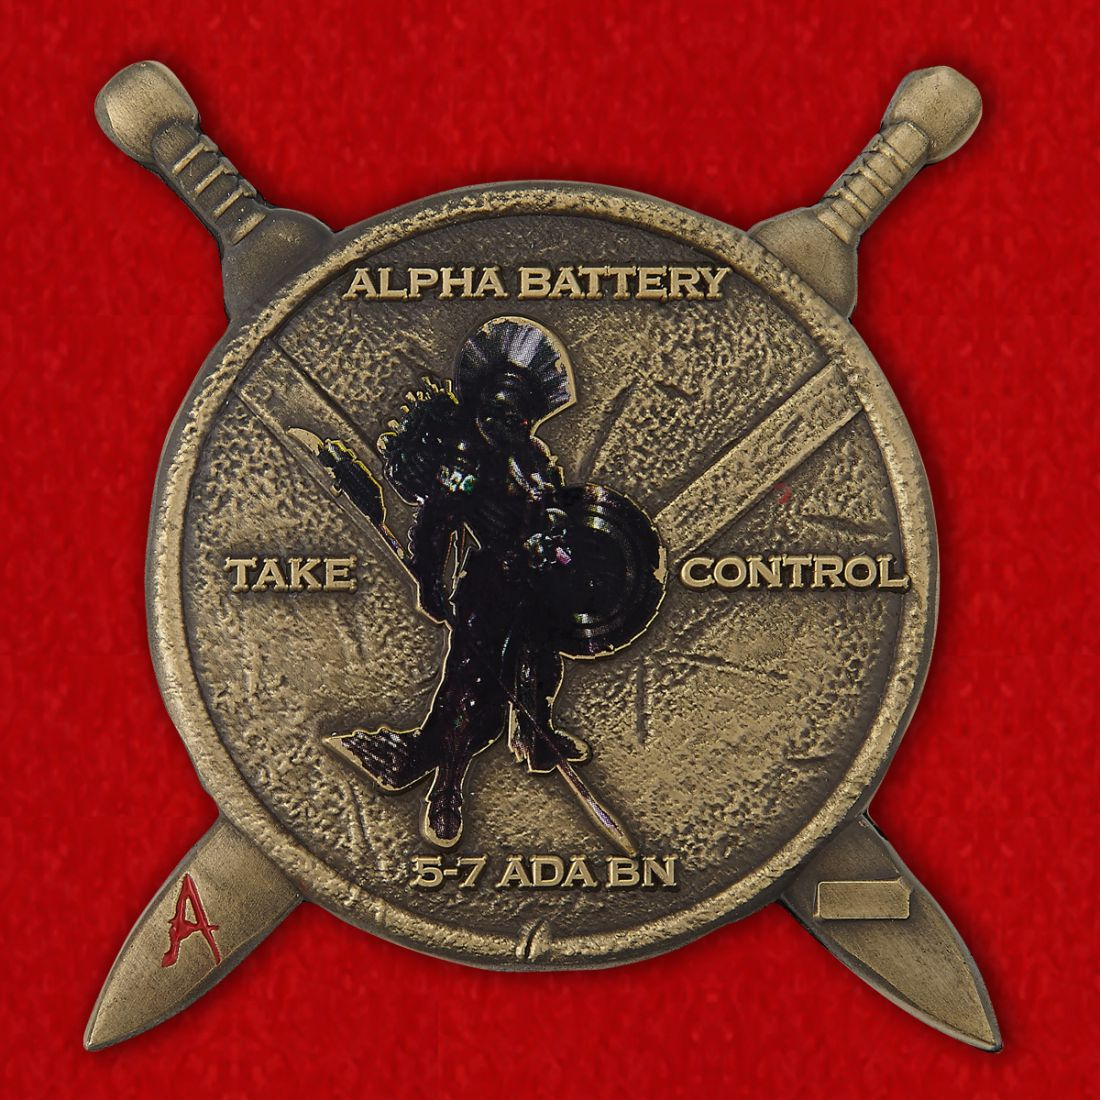 1SG Robinson, CPT Falcon 5-7 ADA BN Challenge Coin